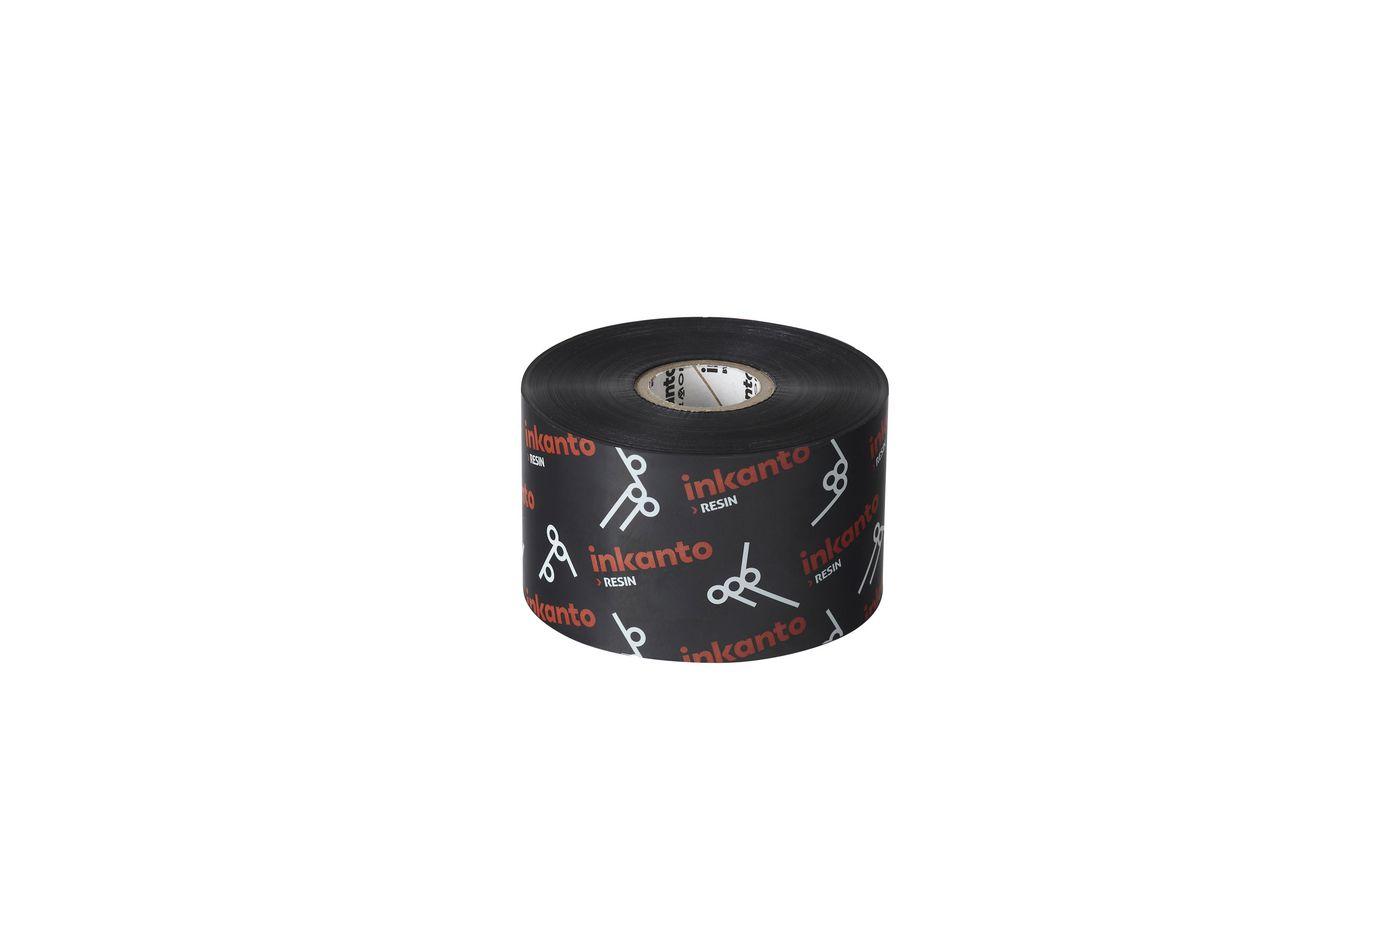 Armor thermal transfer ribbon, AXR7+ resin, 65mm, black